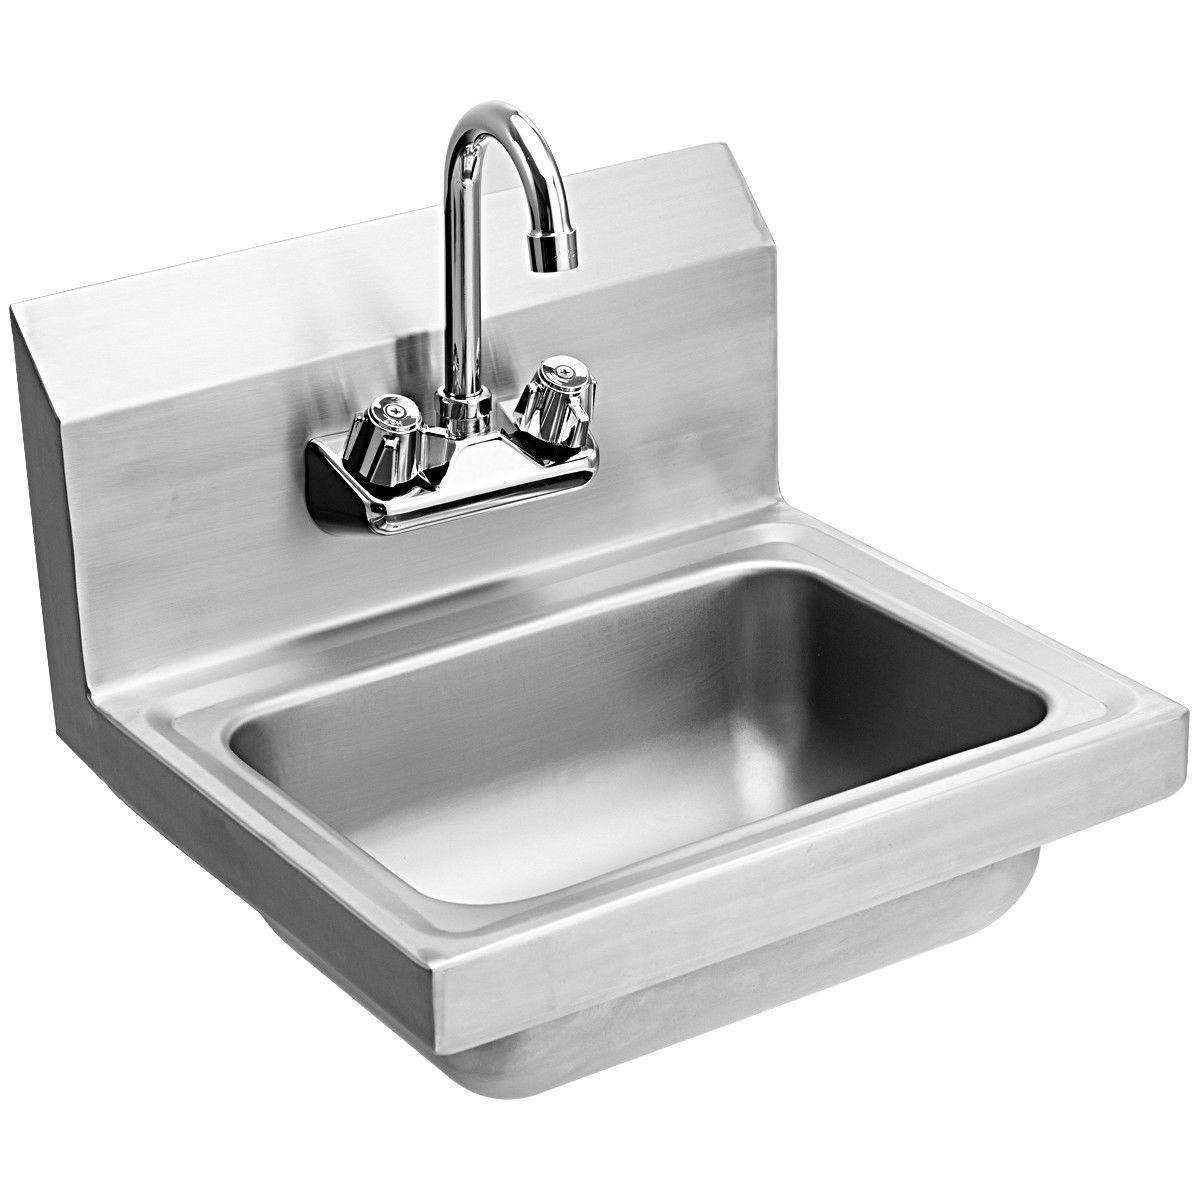 Stainless Steel Wall Mount Washing Sink Basin With Faucet Steel Wall Sink Wall Mounted Sink